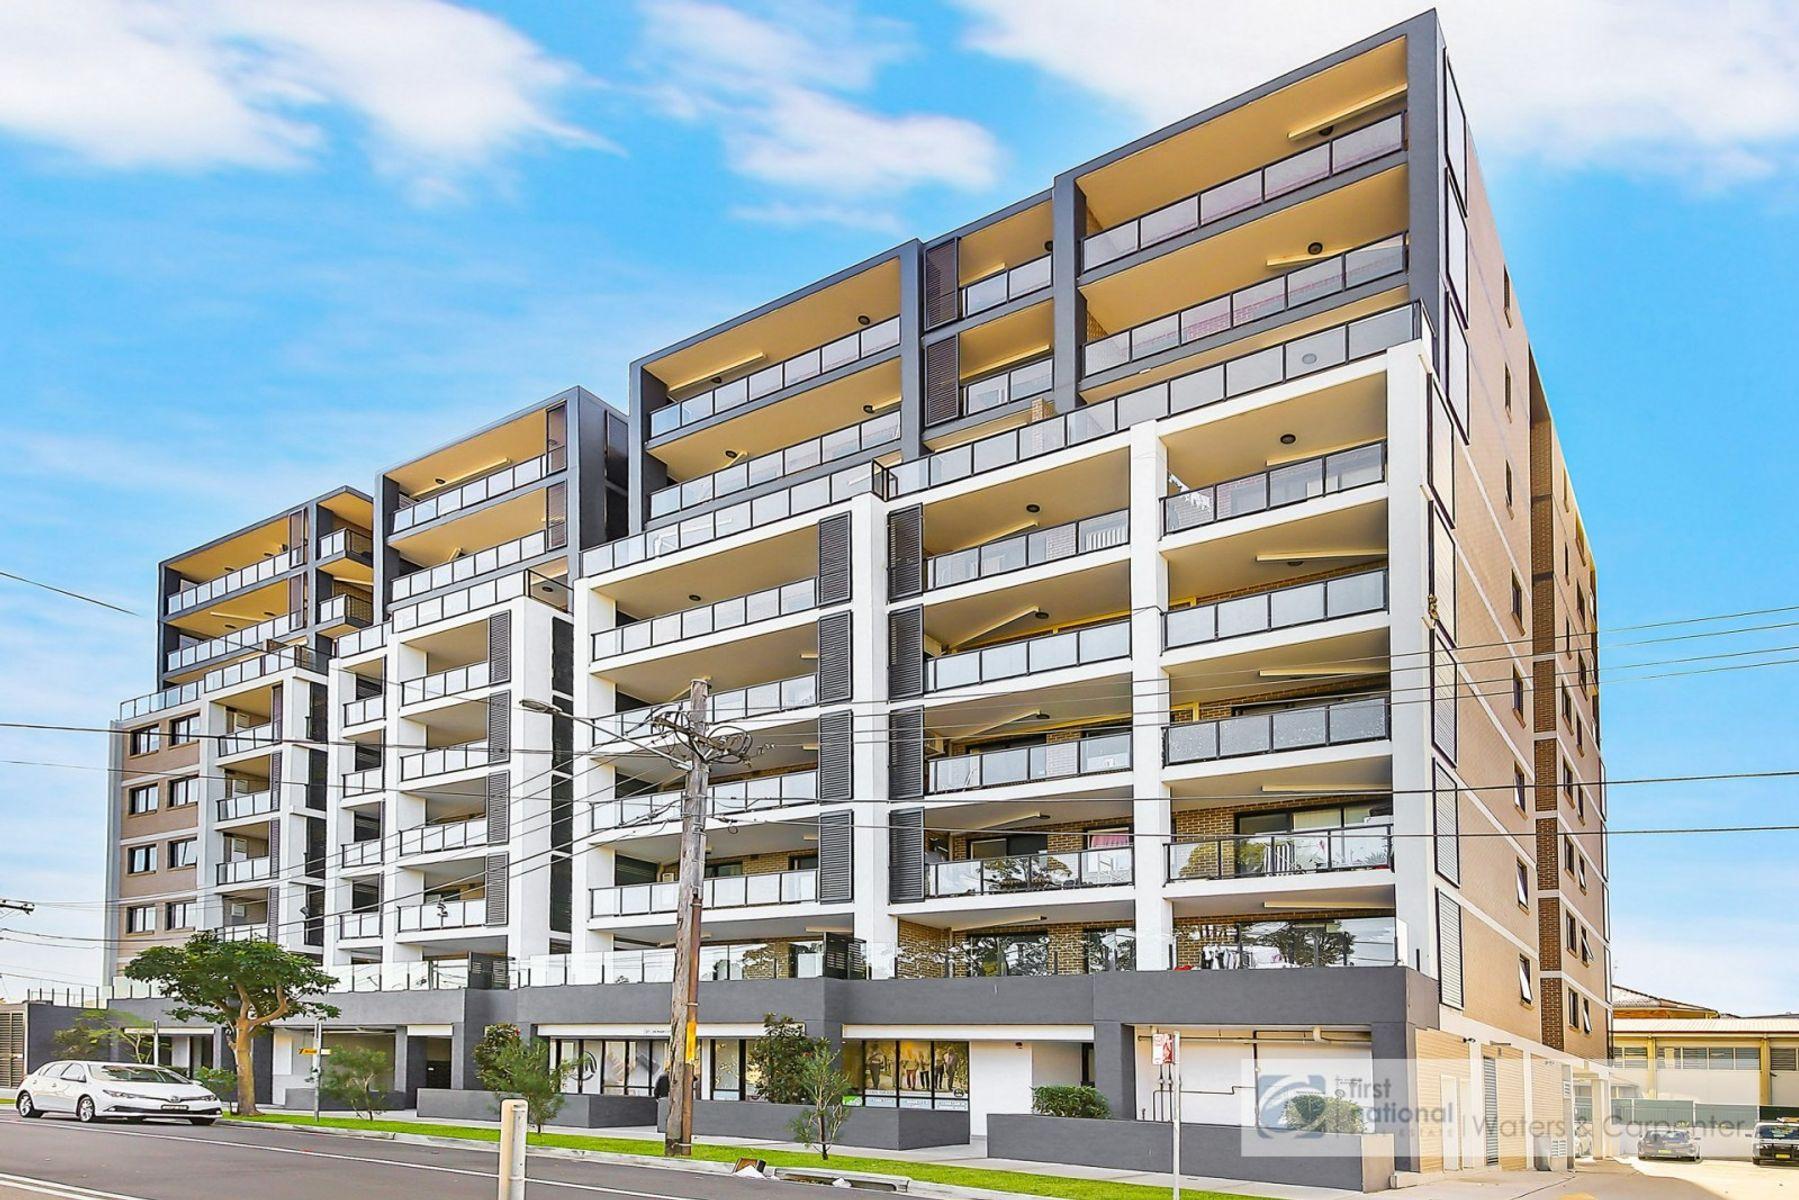 43/27-29 Mary Street, Auburn, NSW 2144